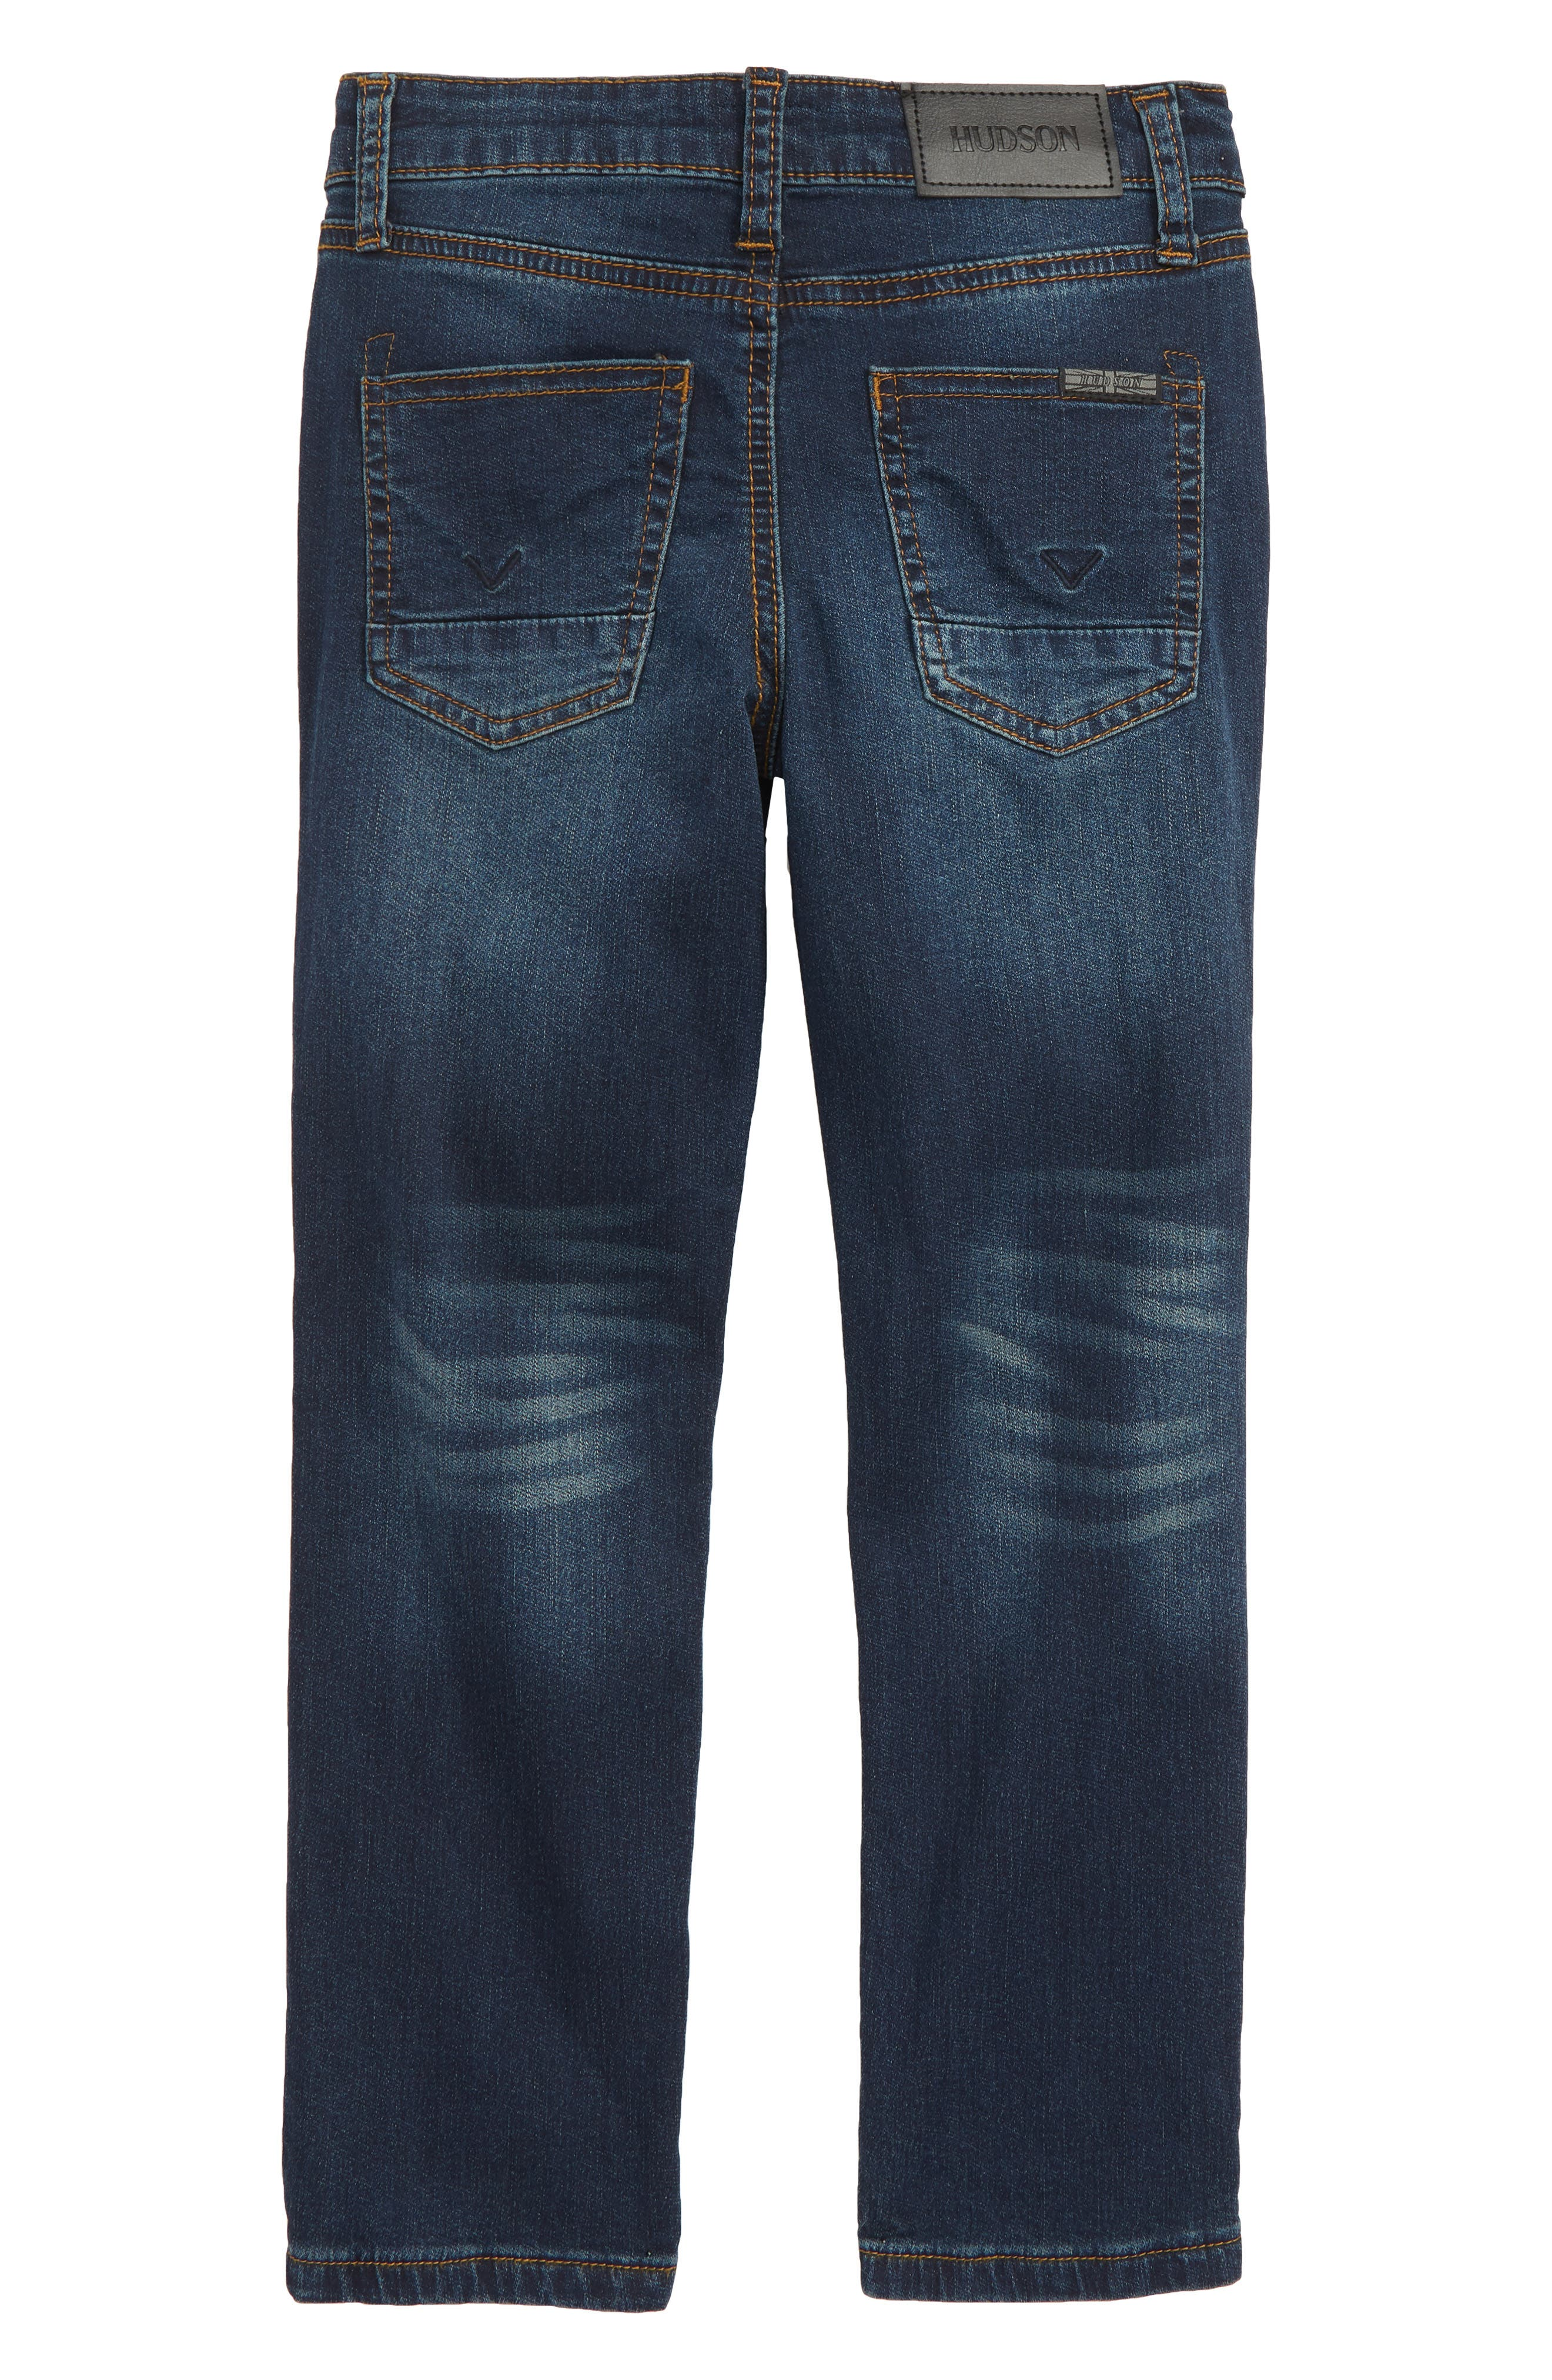 Jagger Slim Fit Straight Leg Jeans,                             Alternate thumbnail 2, color,                             RIPPED RIPEDO